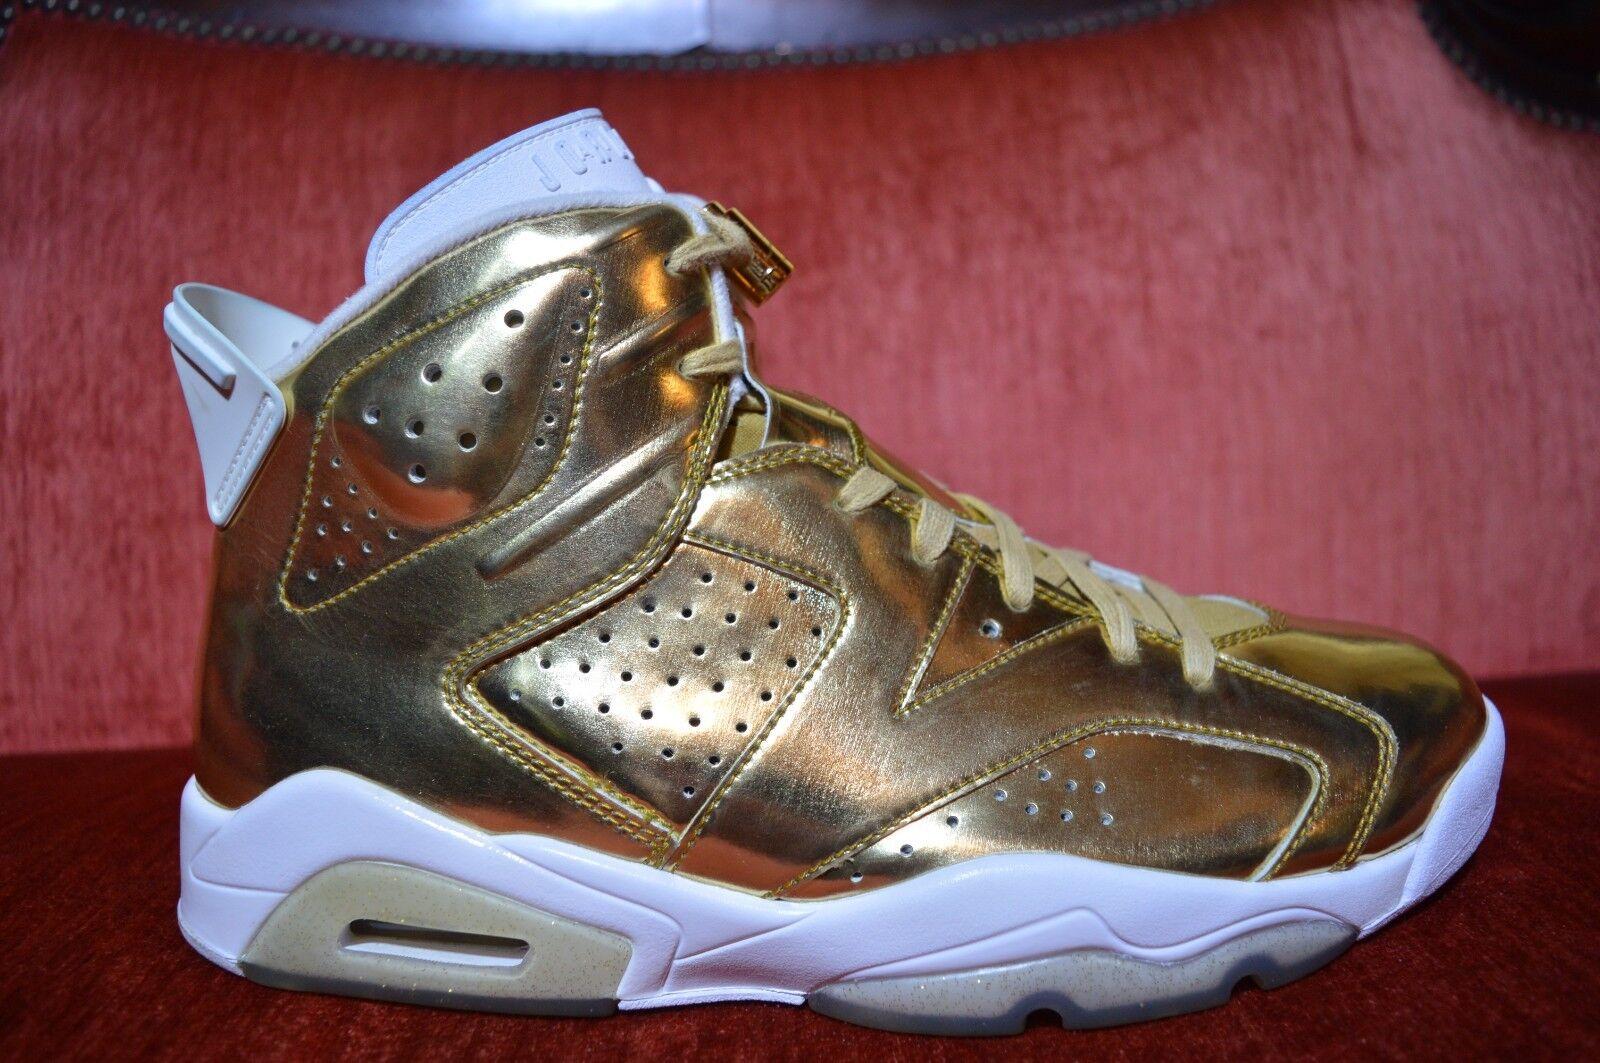 2x nike air jordan consumate 6 vi centro d'oro metallico 854271730 taglia 10 d'oro centro 606baa